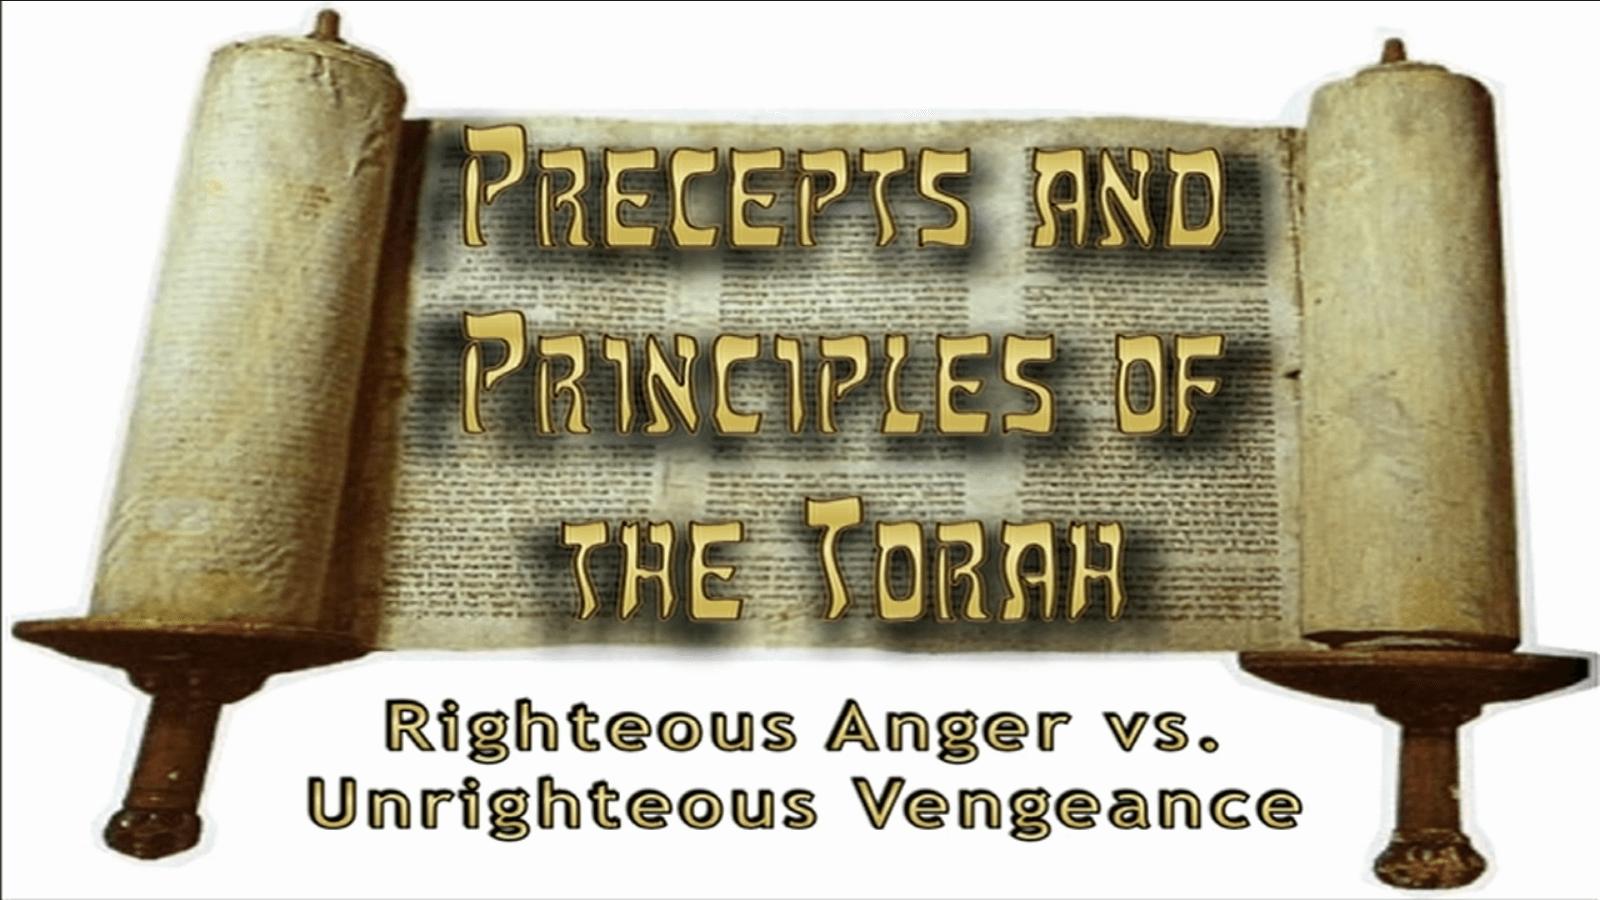 Precepts & Principles of the Torah - Righteous Indignation vs. Unrighteous Vengeance - Study